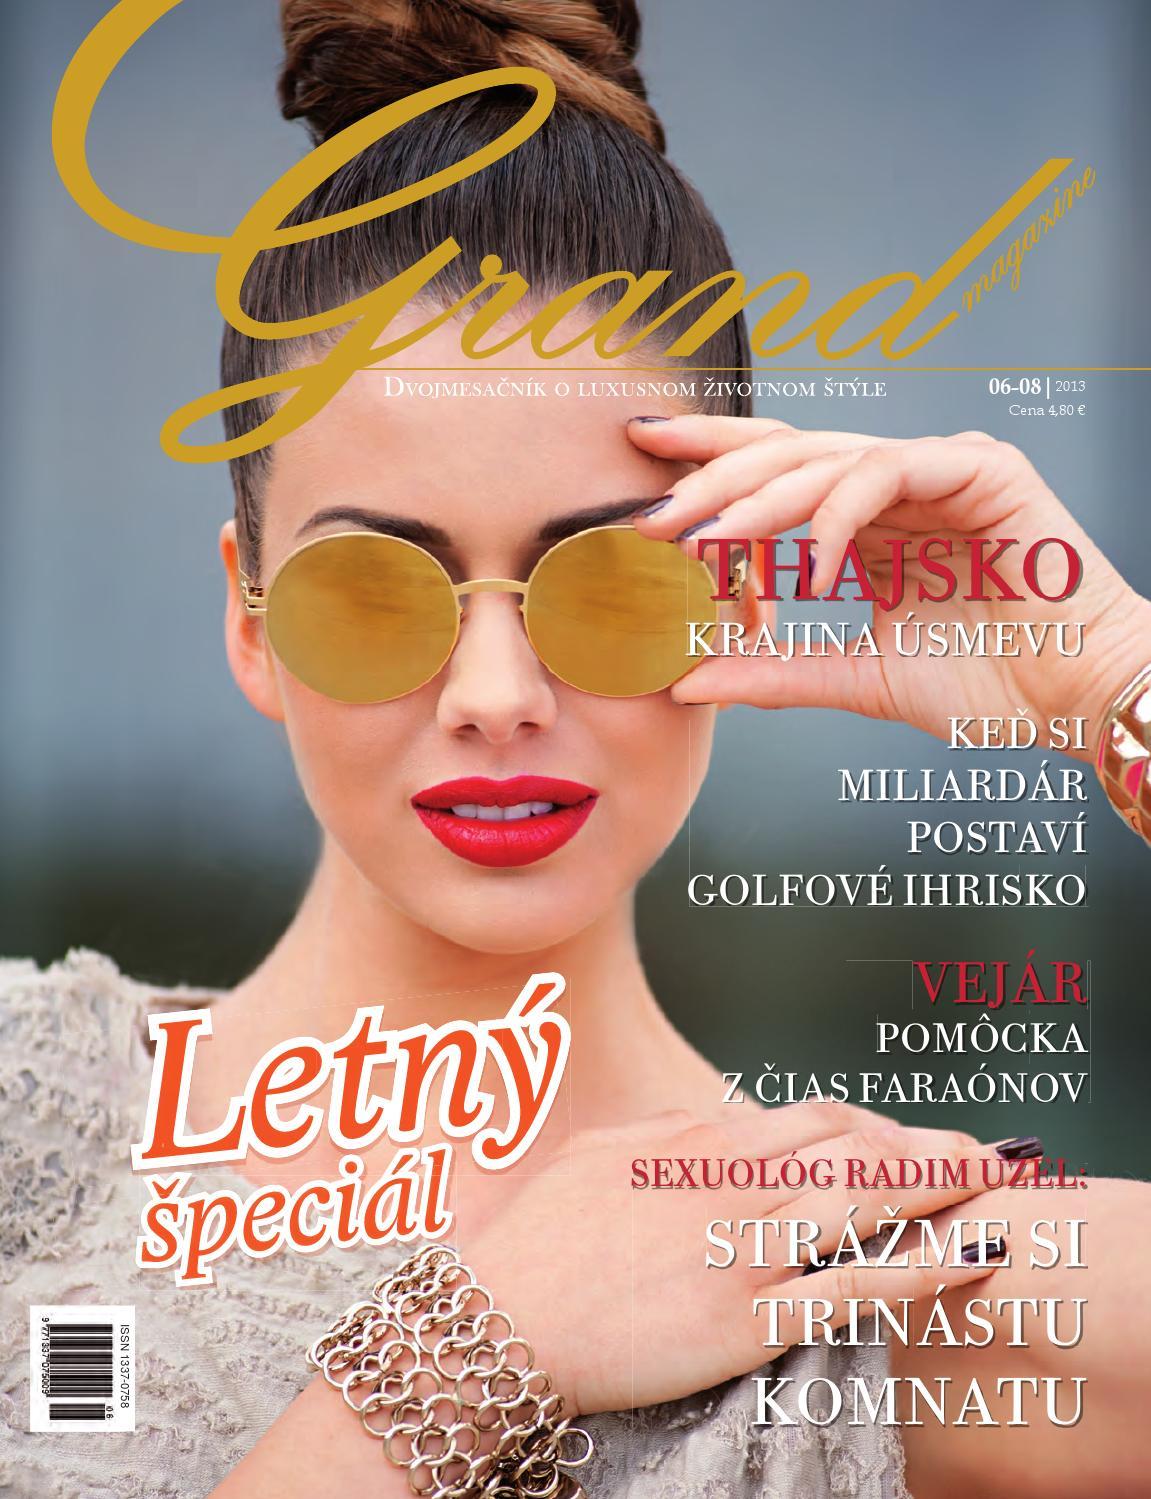 96abc4453171 2013 grandmagazine 6 8 by ArgusMedia - issuu